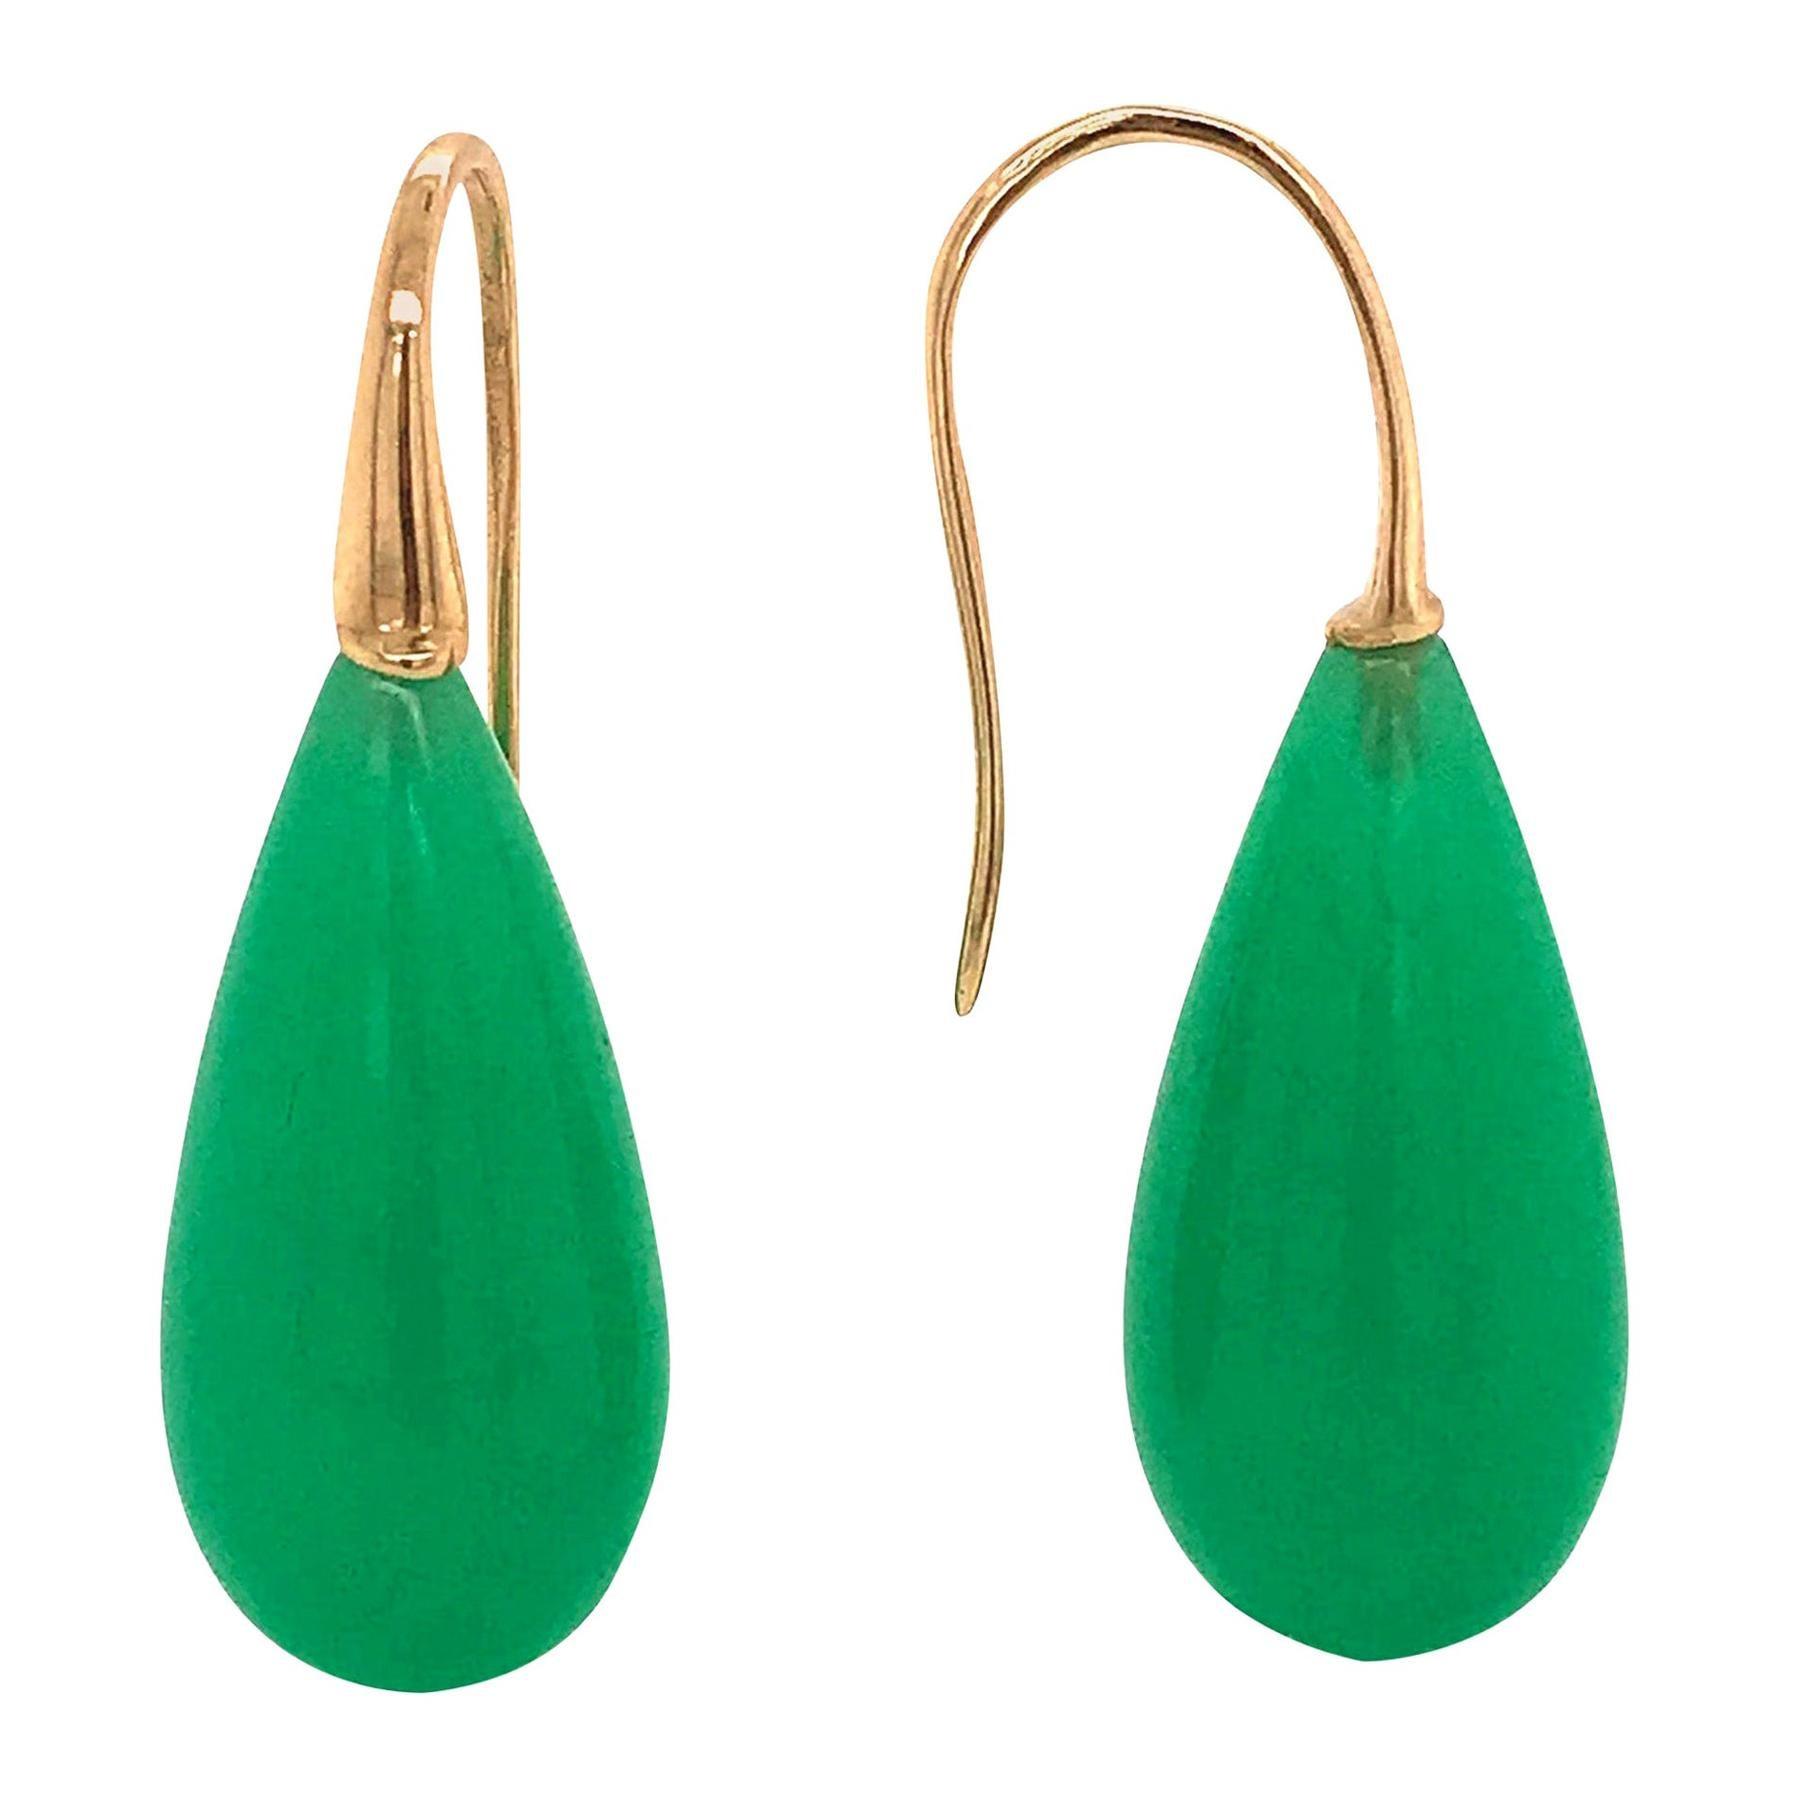 Elegant Yellow Gold and Jade Drop Earrings 18 Karat